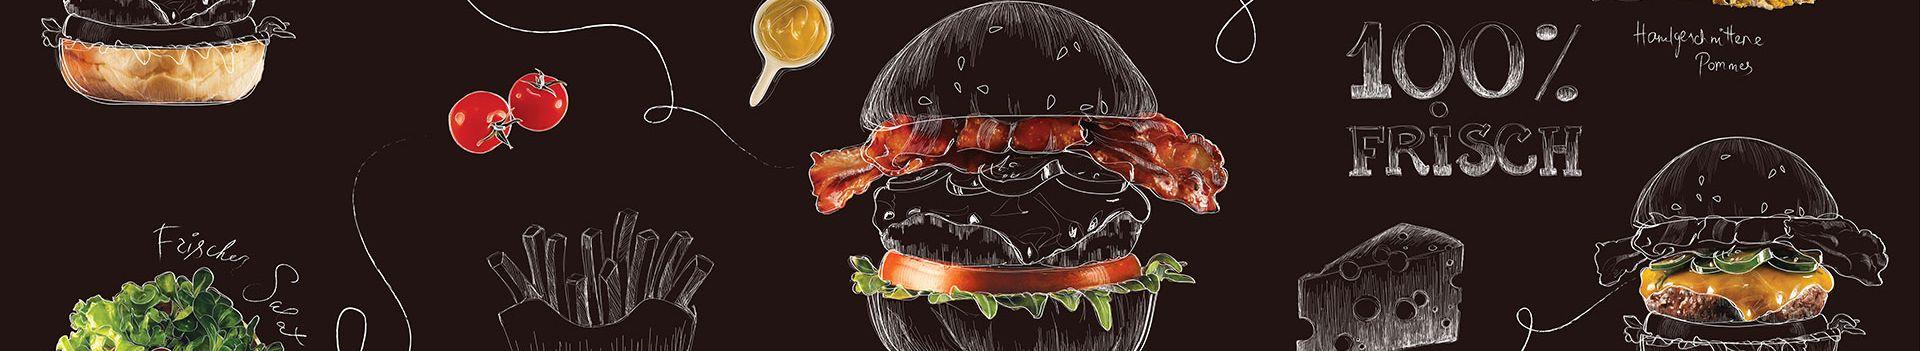 Burger Eck Lieferservice in Graz